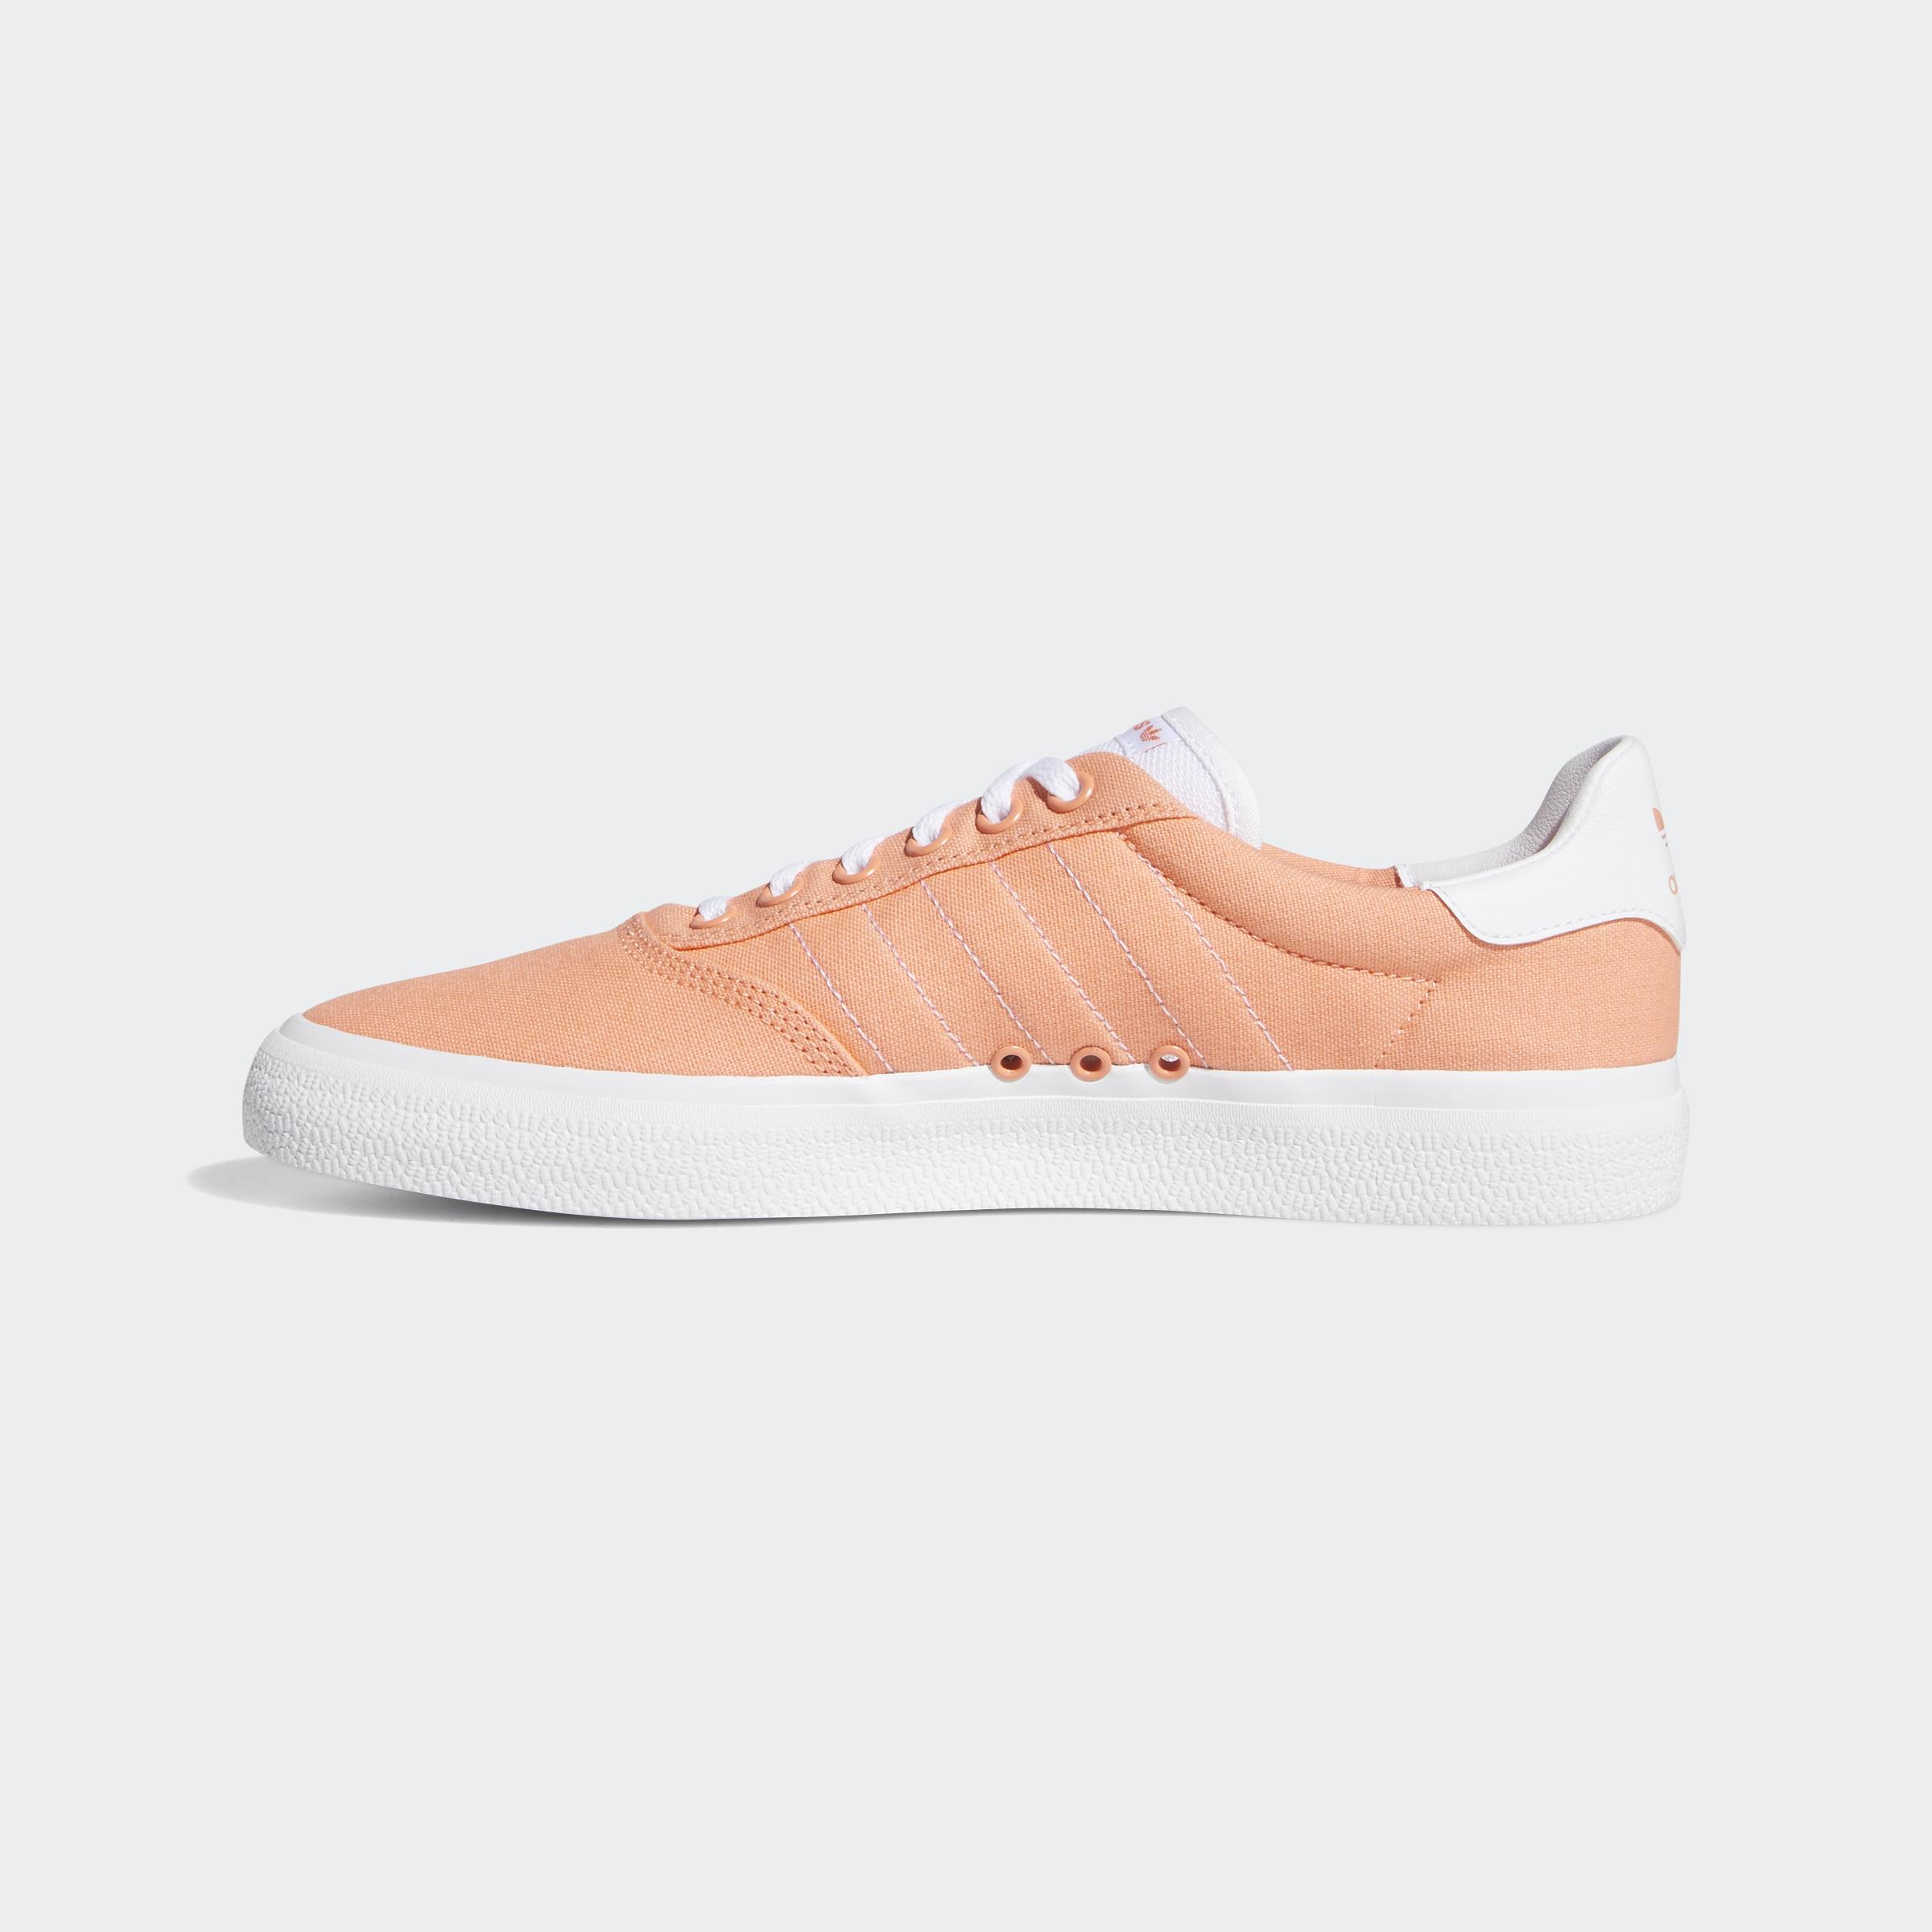 adidas-3MC-Shoes-Athletic-amp-Sneakers thumbnail 24